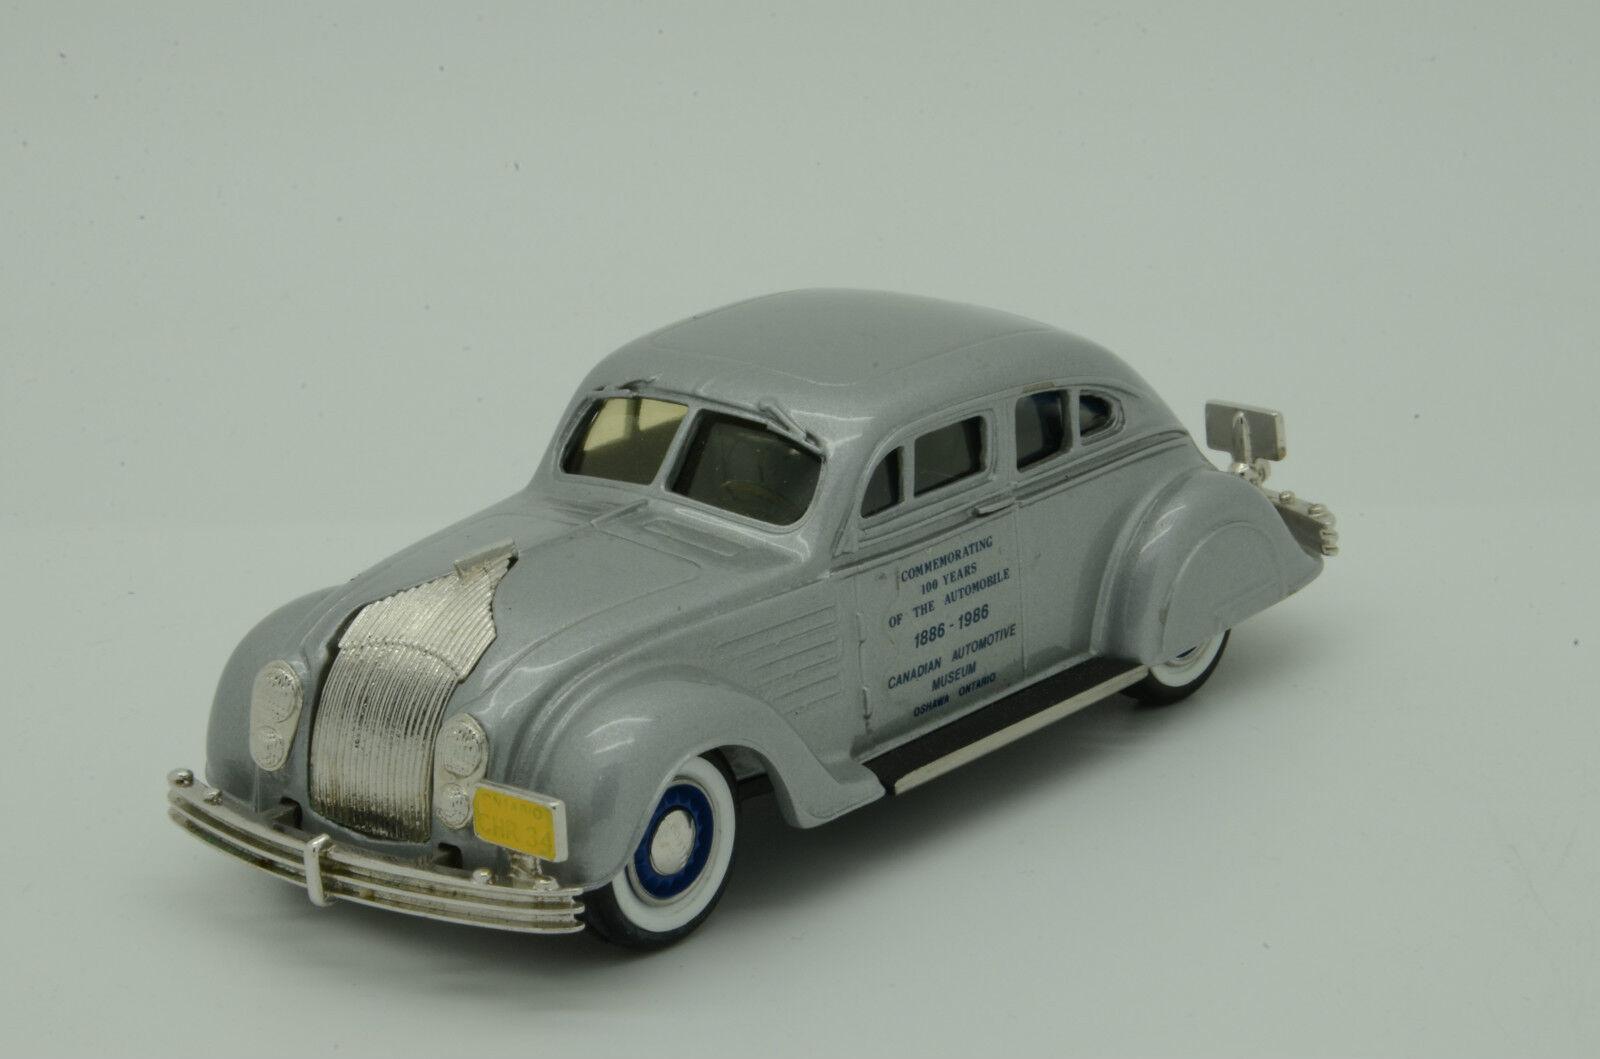 Raro Chrysler Airflow 1934 Dos Puerta coupe100years Museo Durham 1 43 Lim